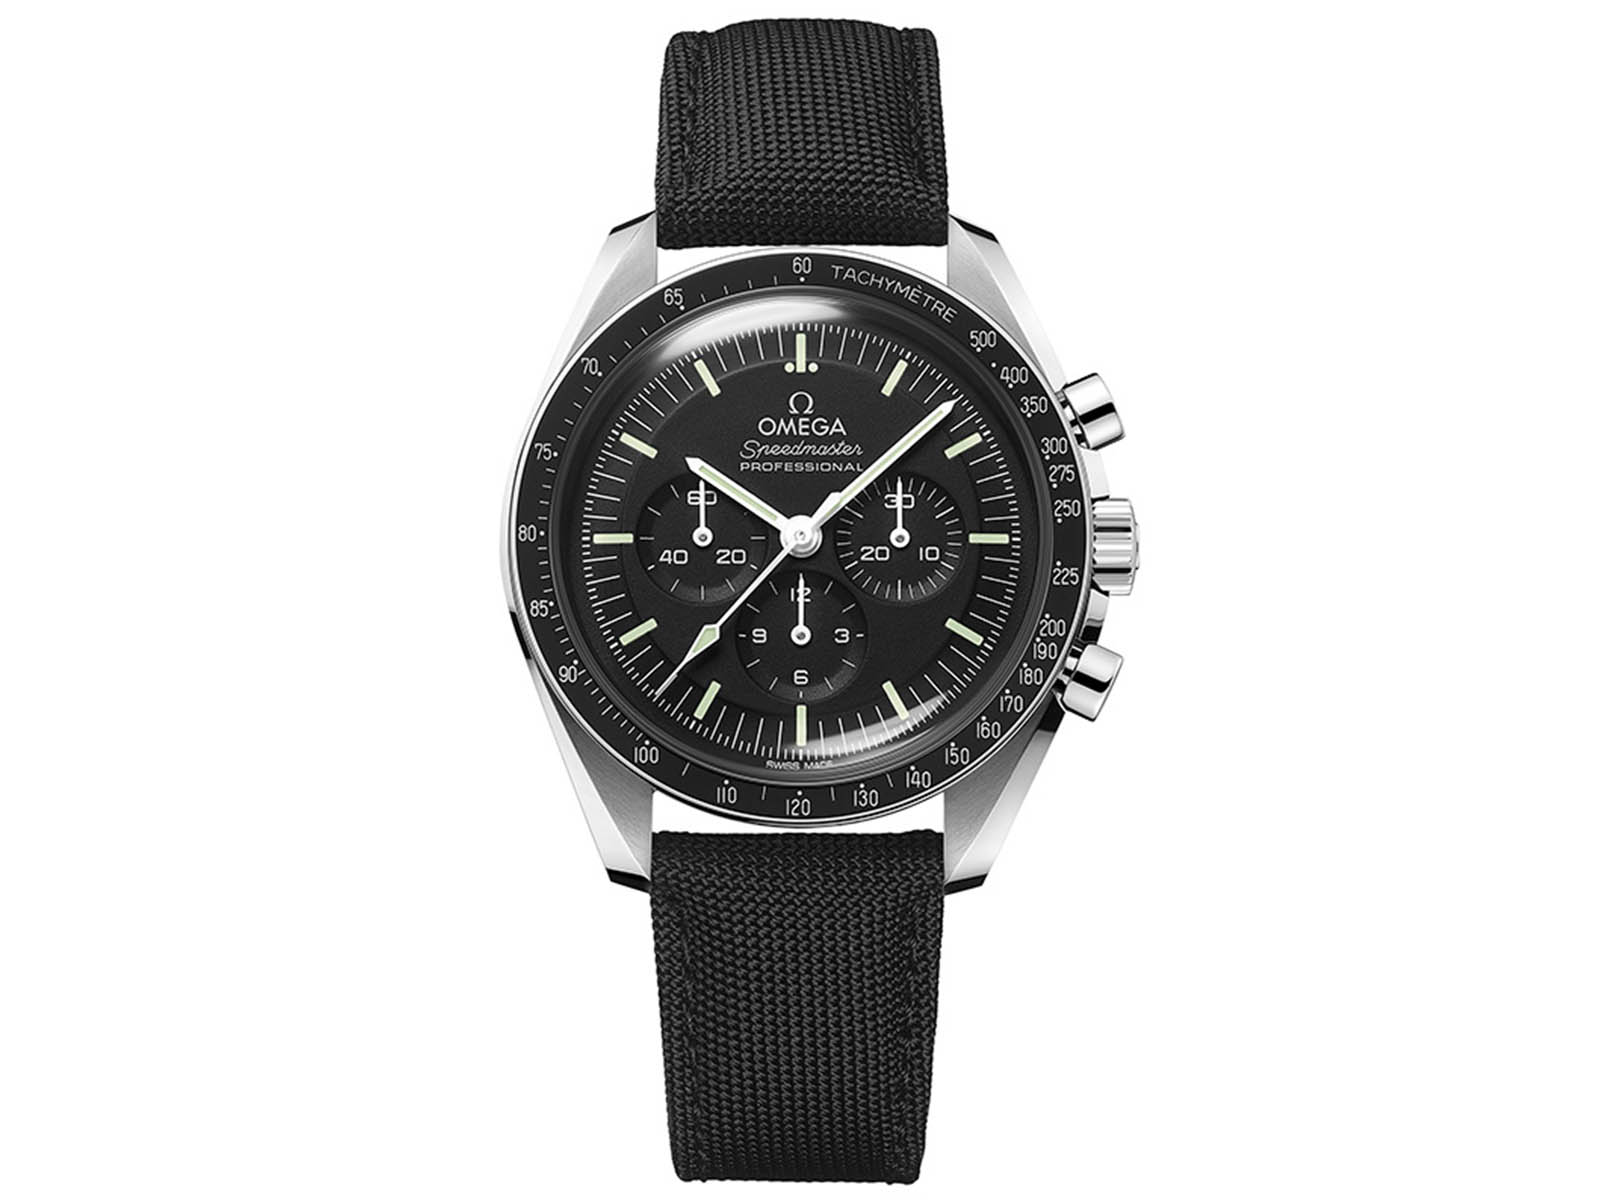 310-32-42-50-01-001-omega-speedmaster-moonwatch-professional-master-chronometer-1.jpg